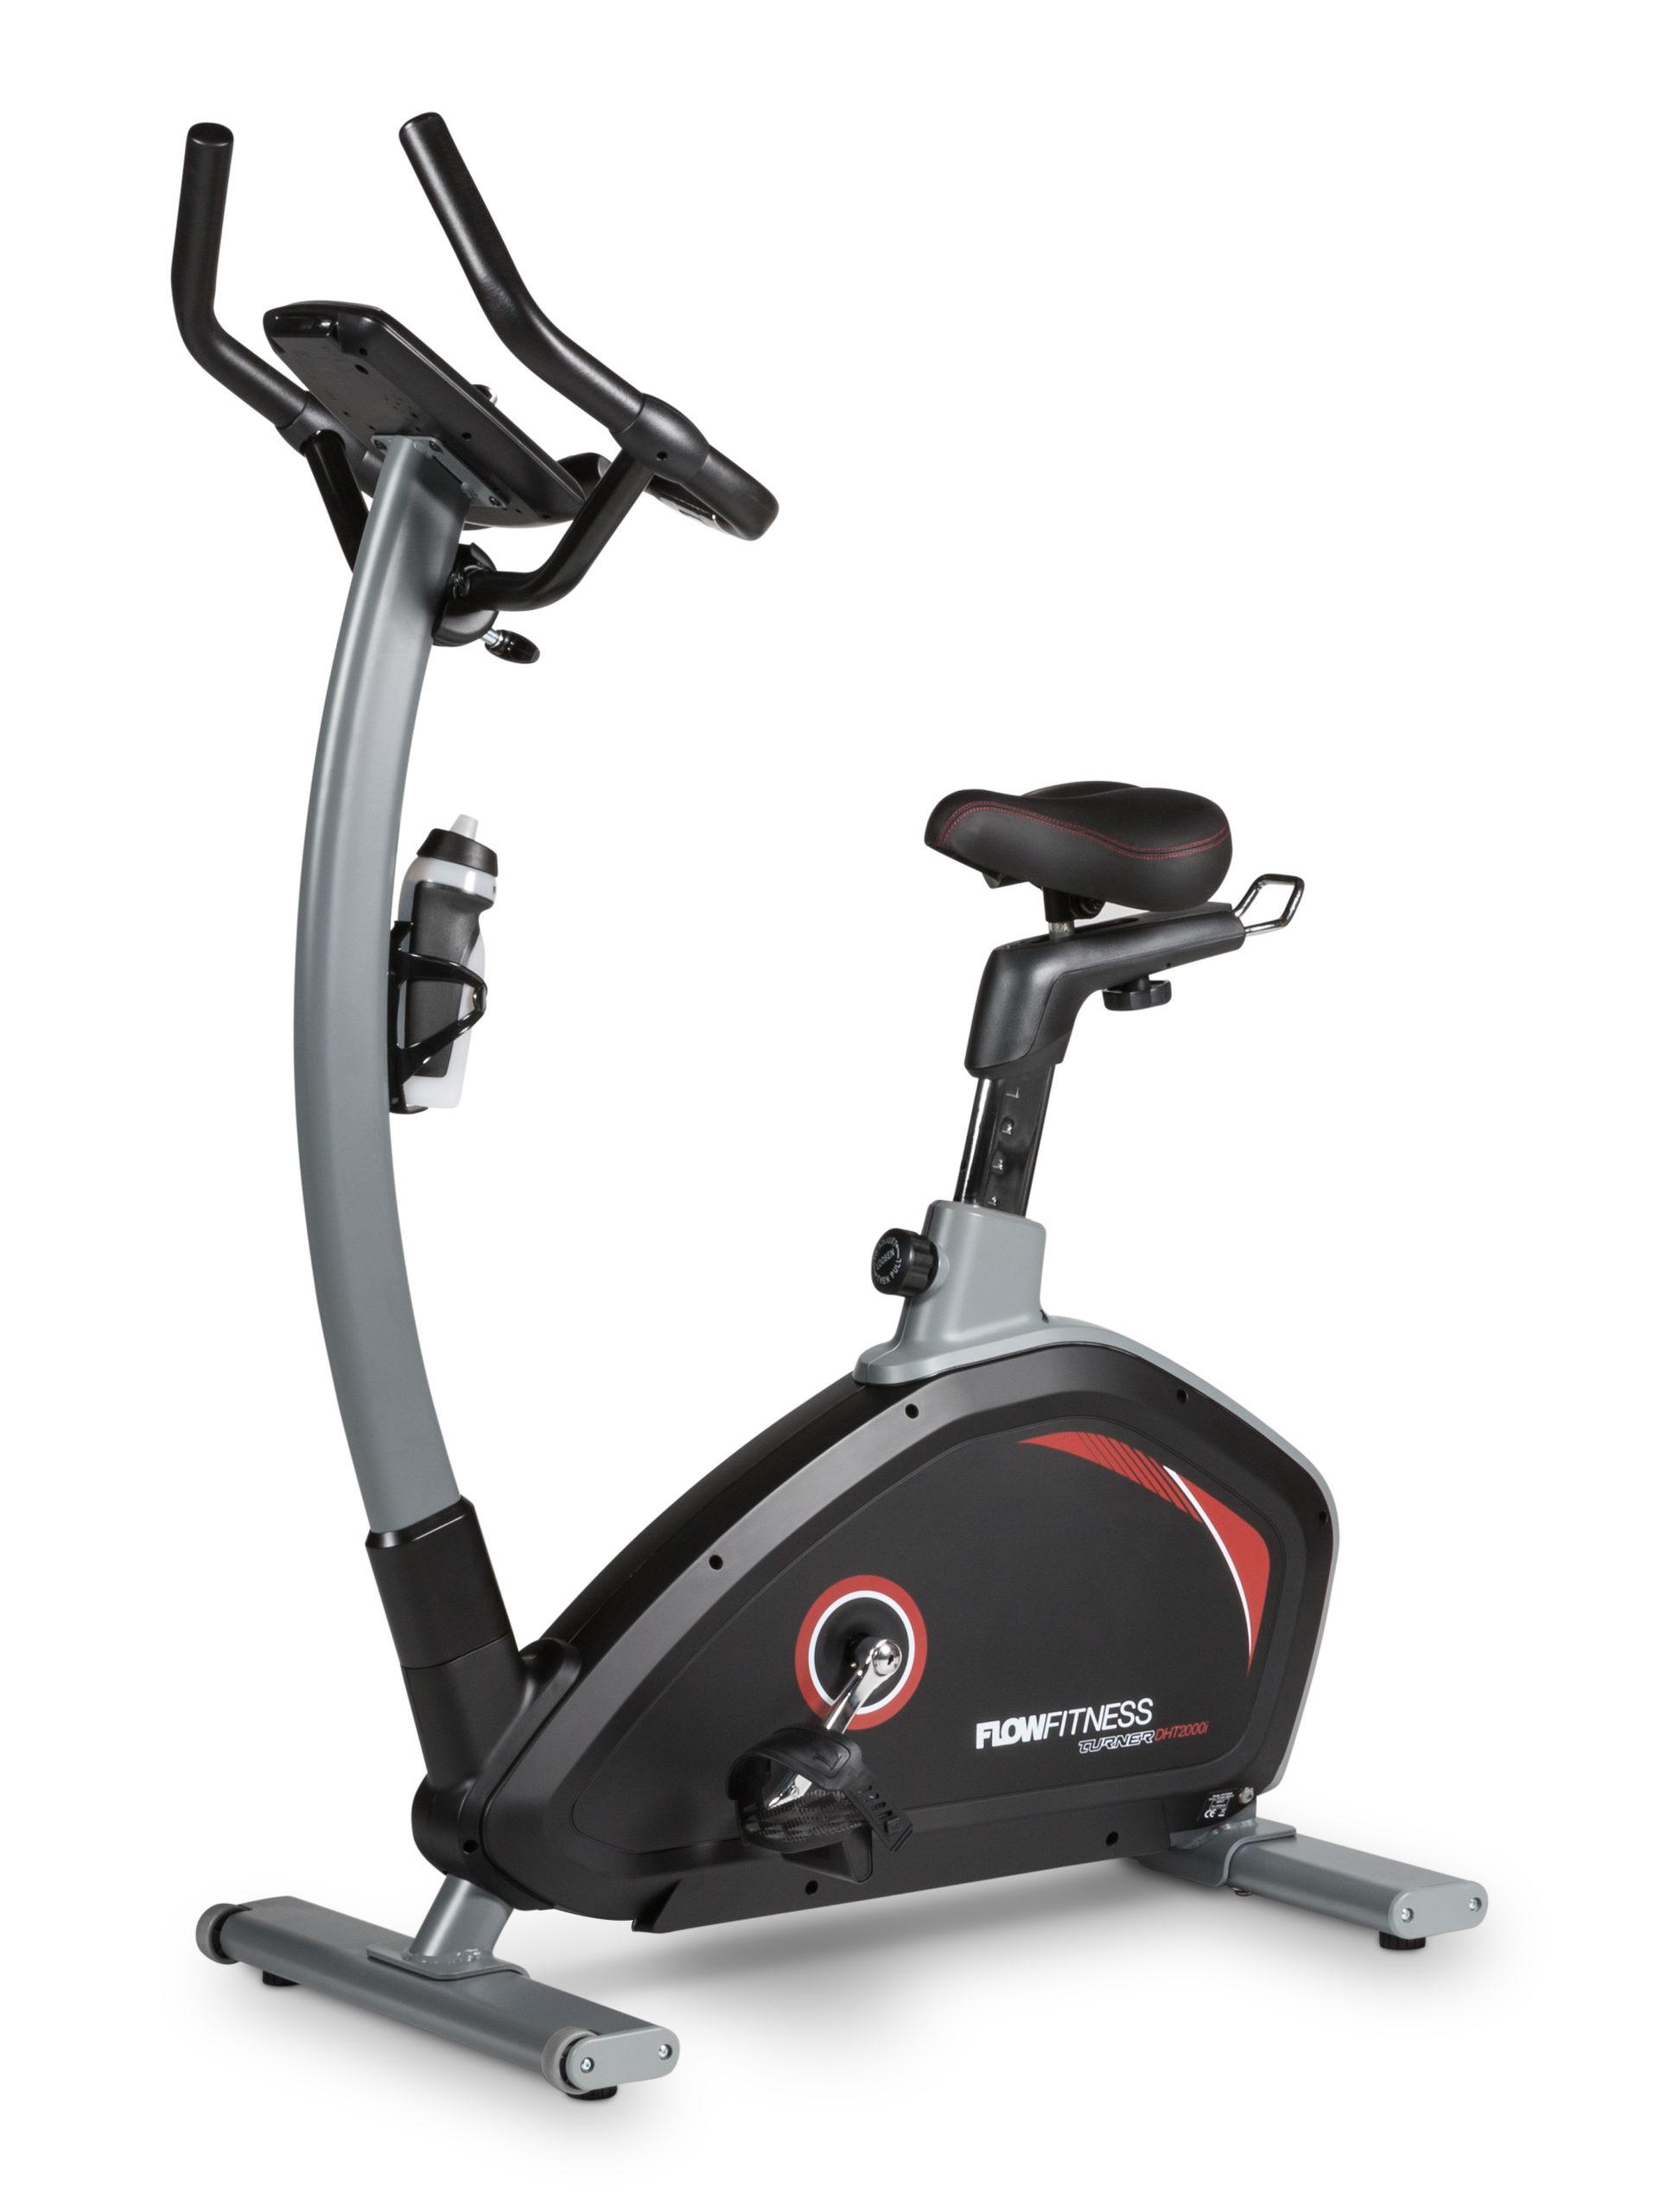 Flow Fitness Tabel Turner DHT2000i Hometrainer 12